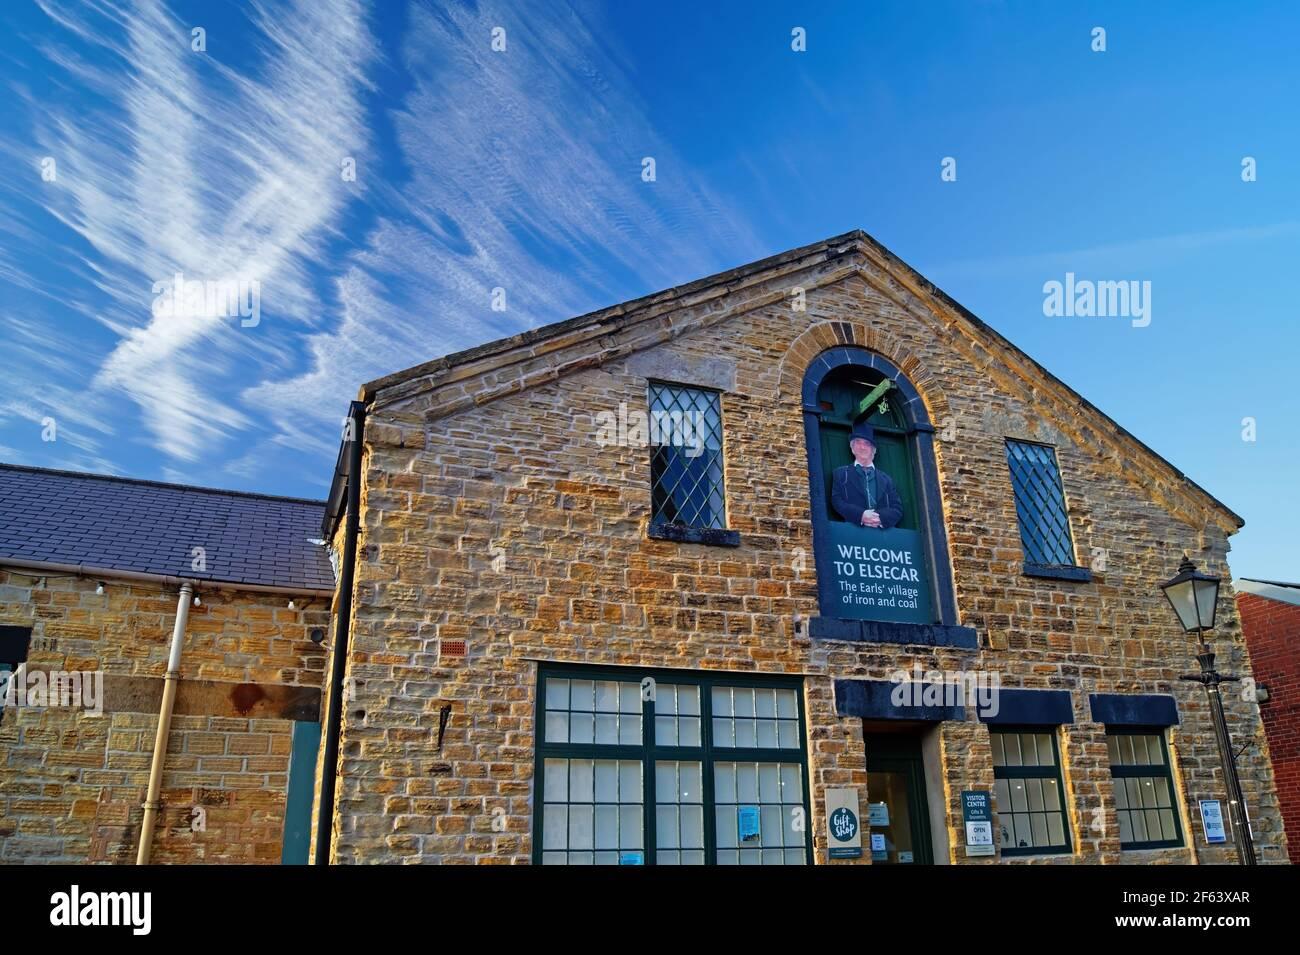 Reino Unido, Yorkshire del Sur, Elsecar Heritage Center Gift Shop Foto de stock